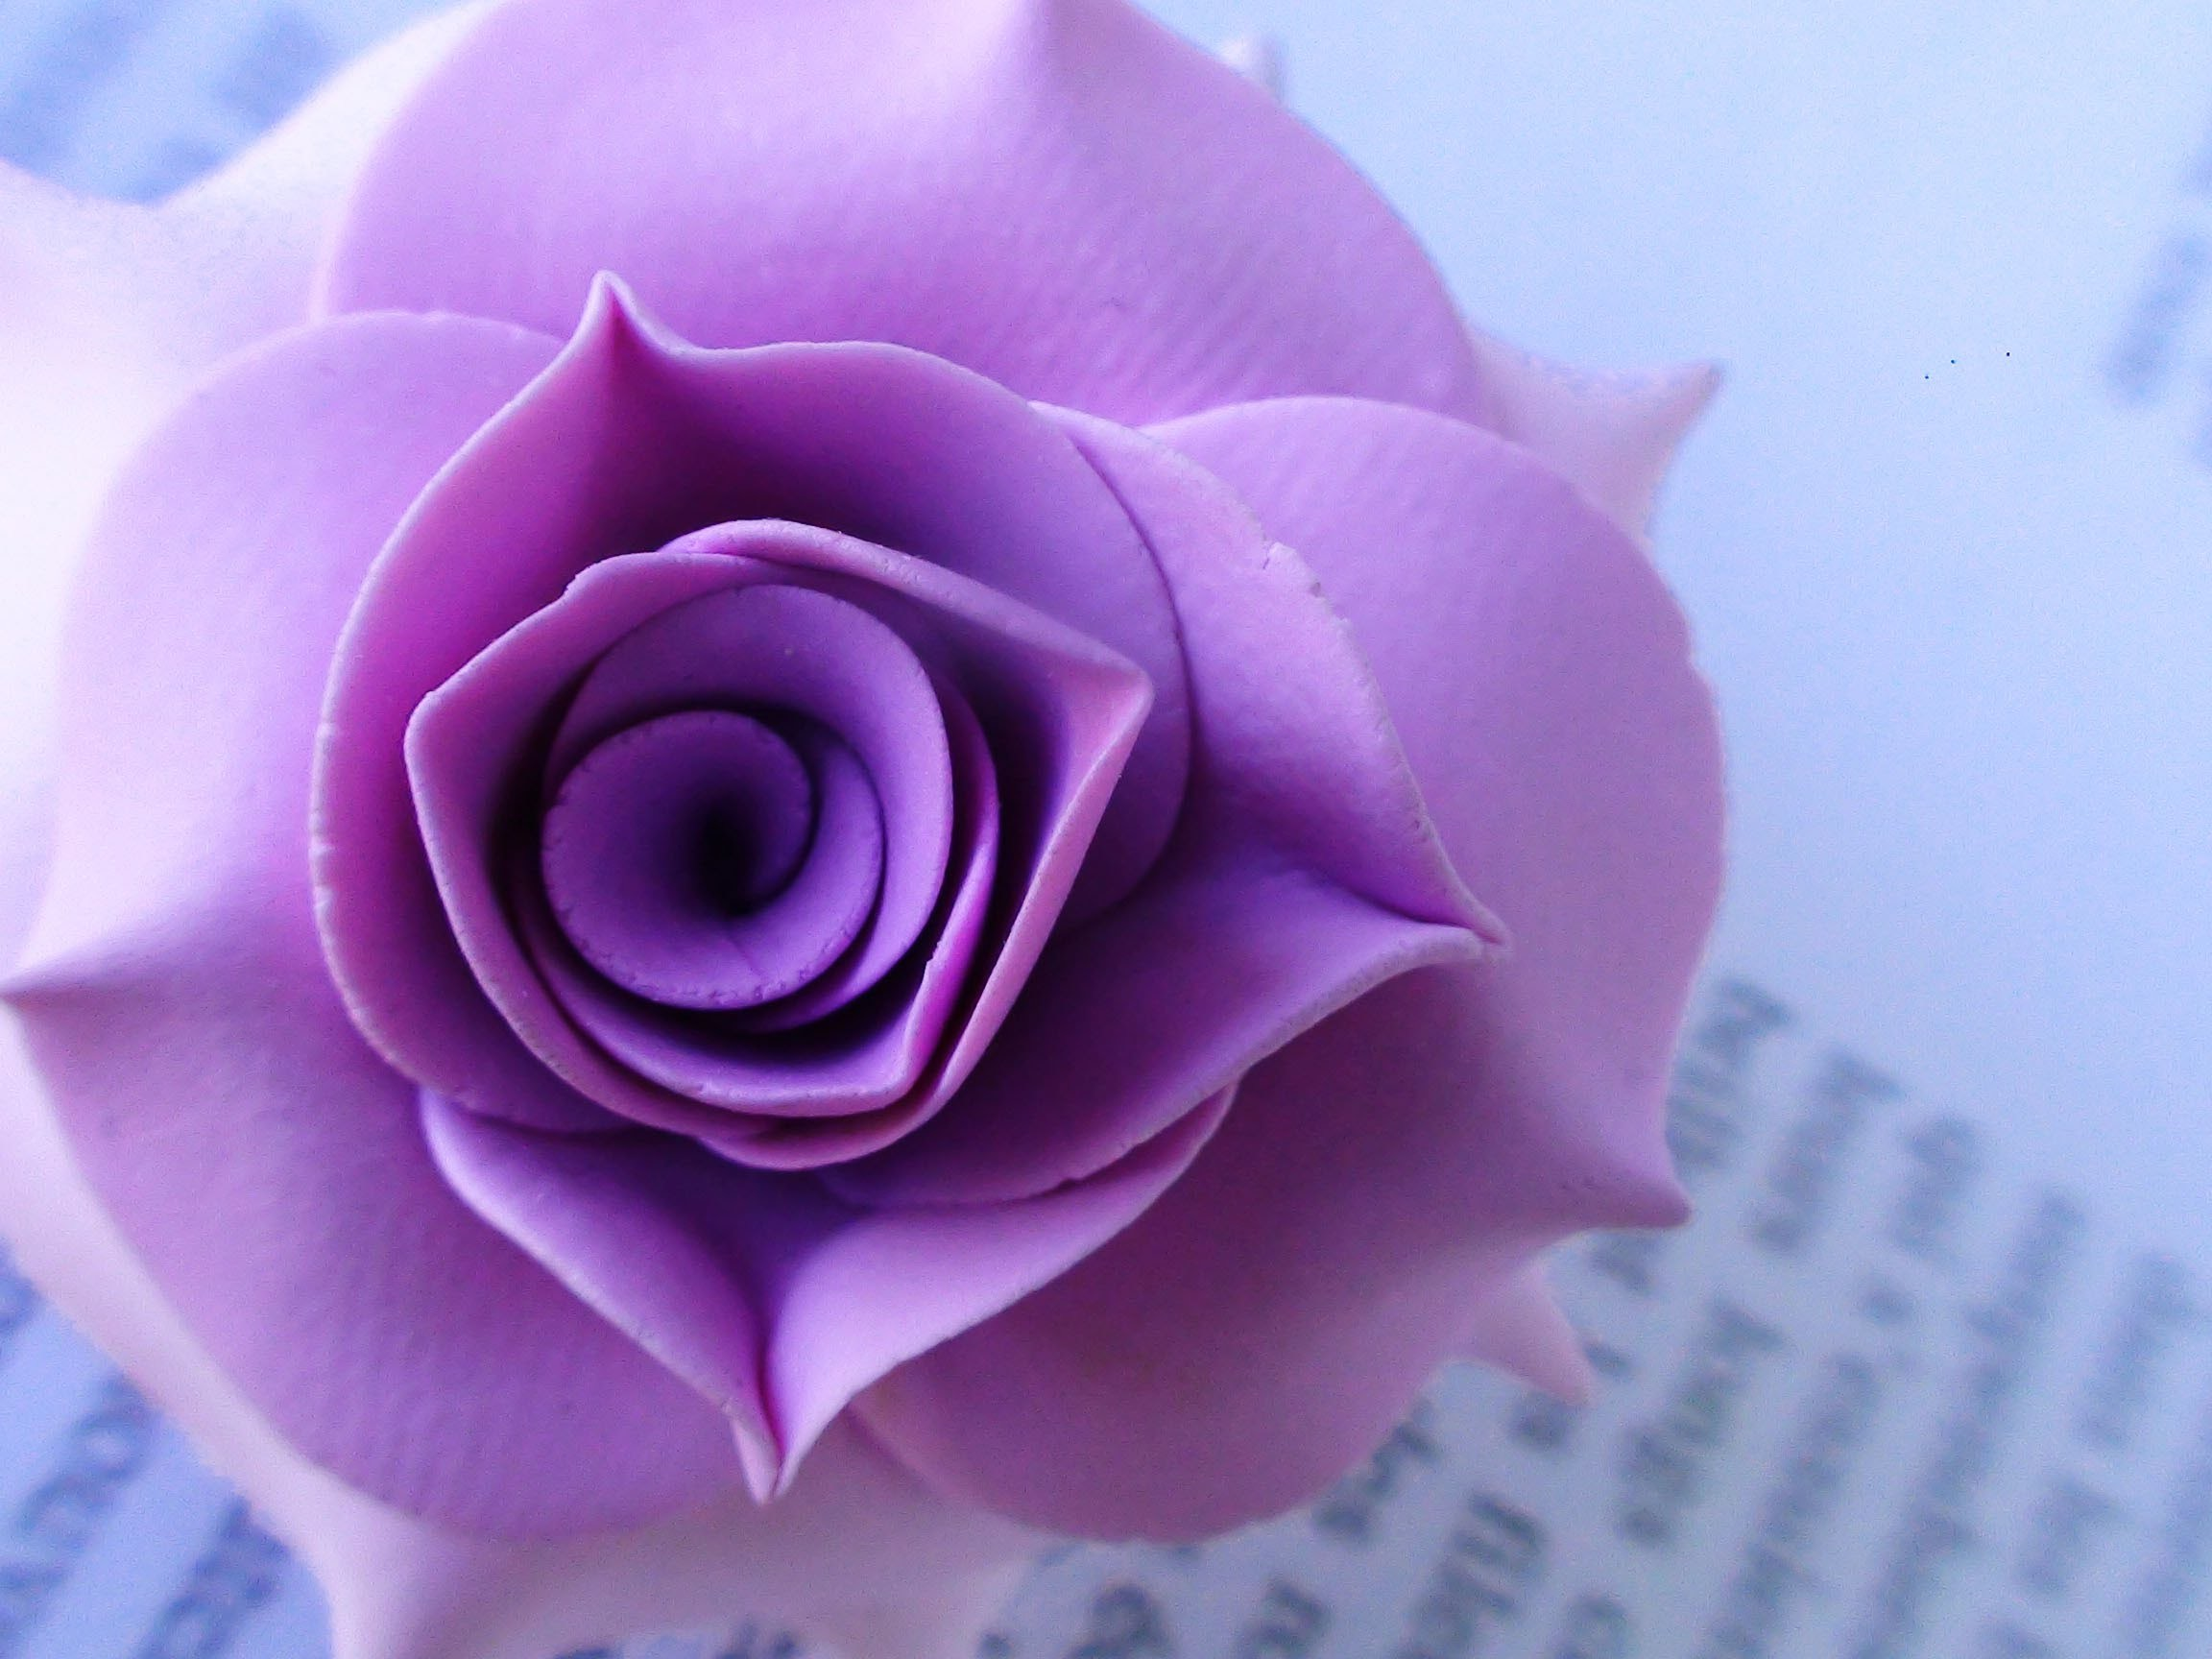 Tuto fimo : rose réaliste - polymer clay tutorial rose